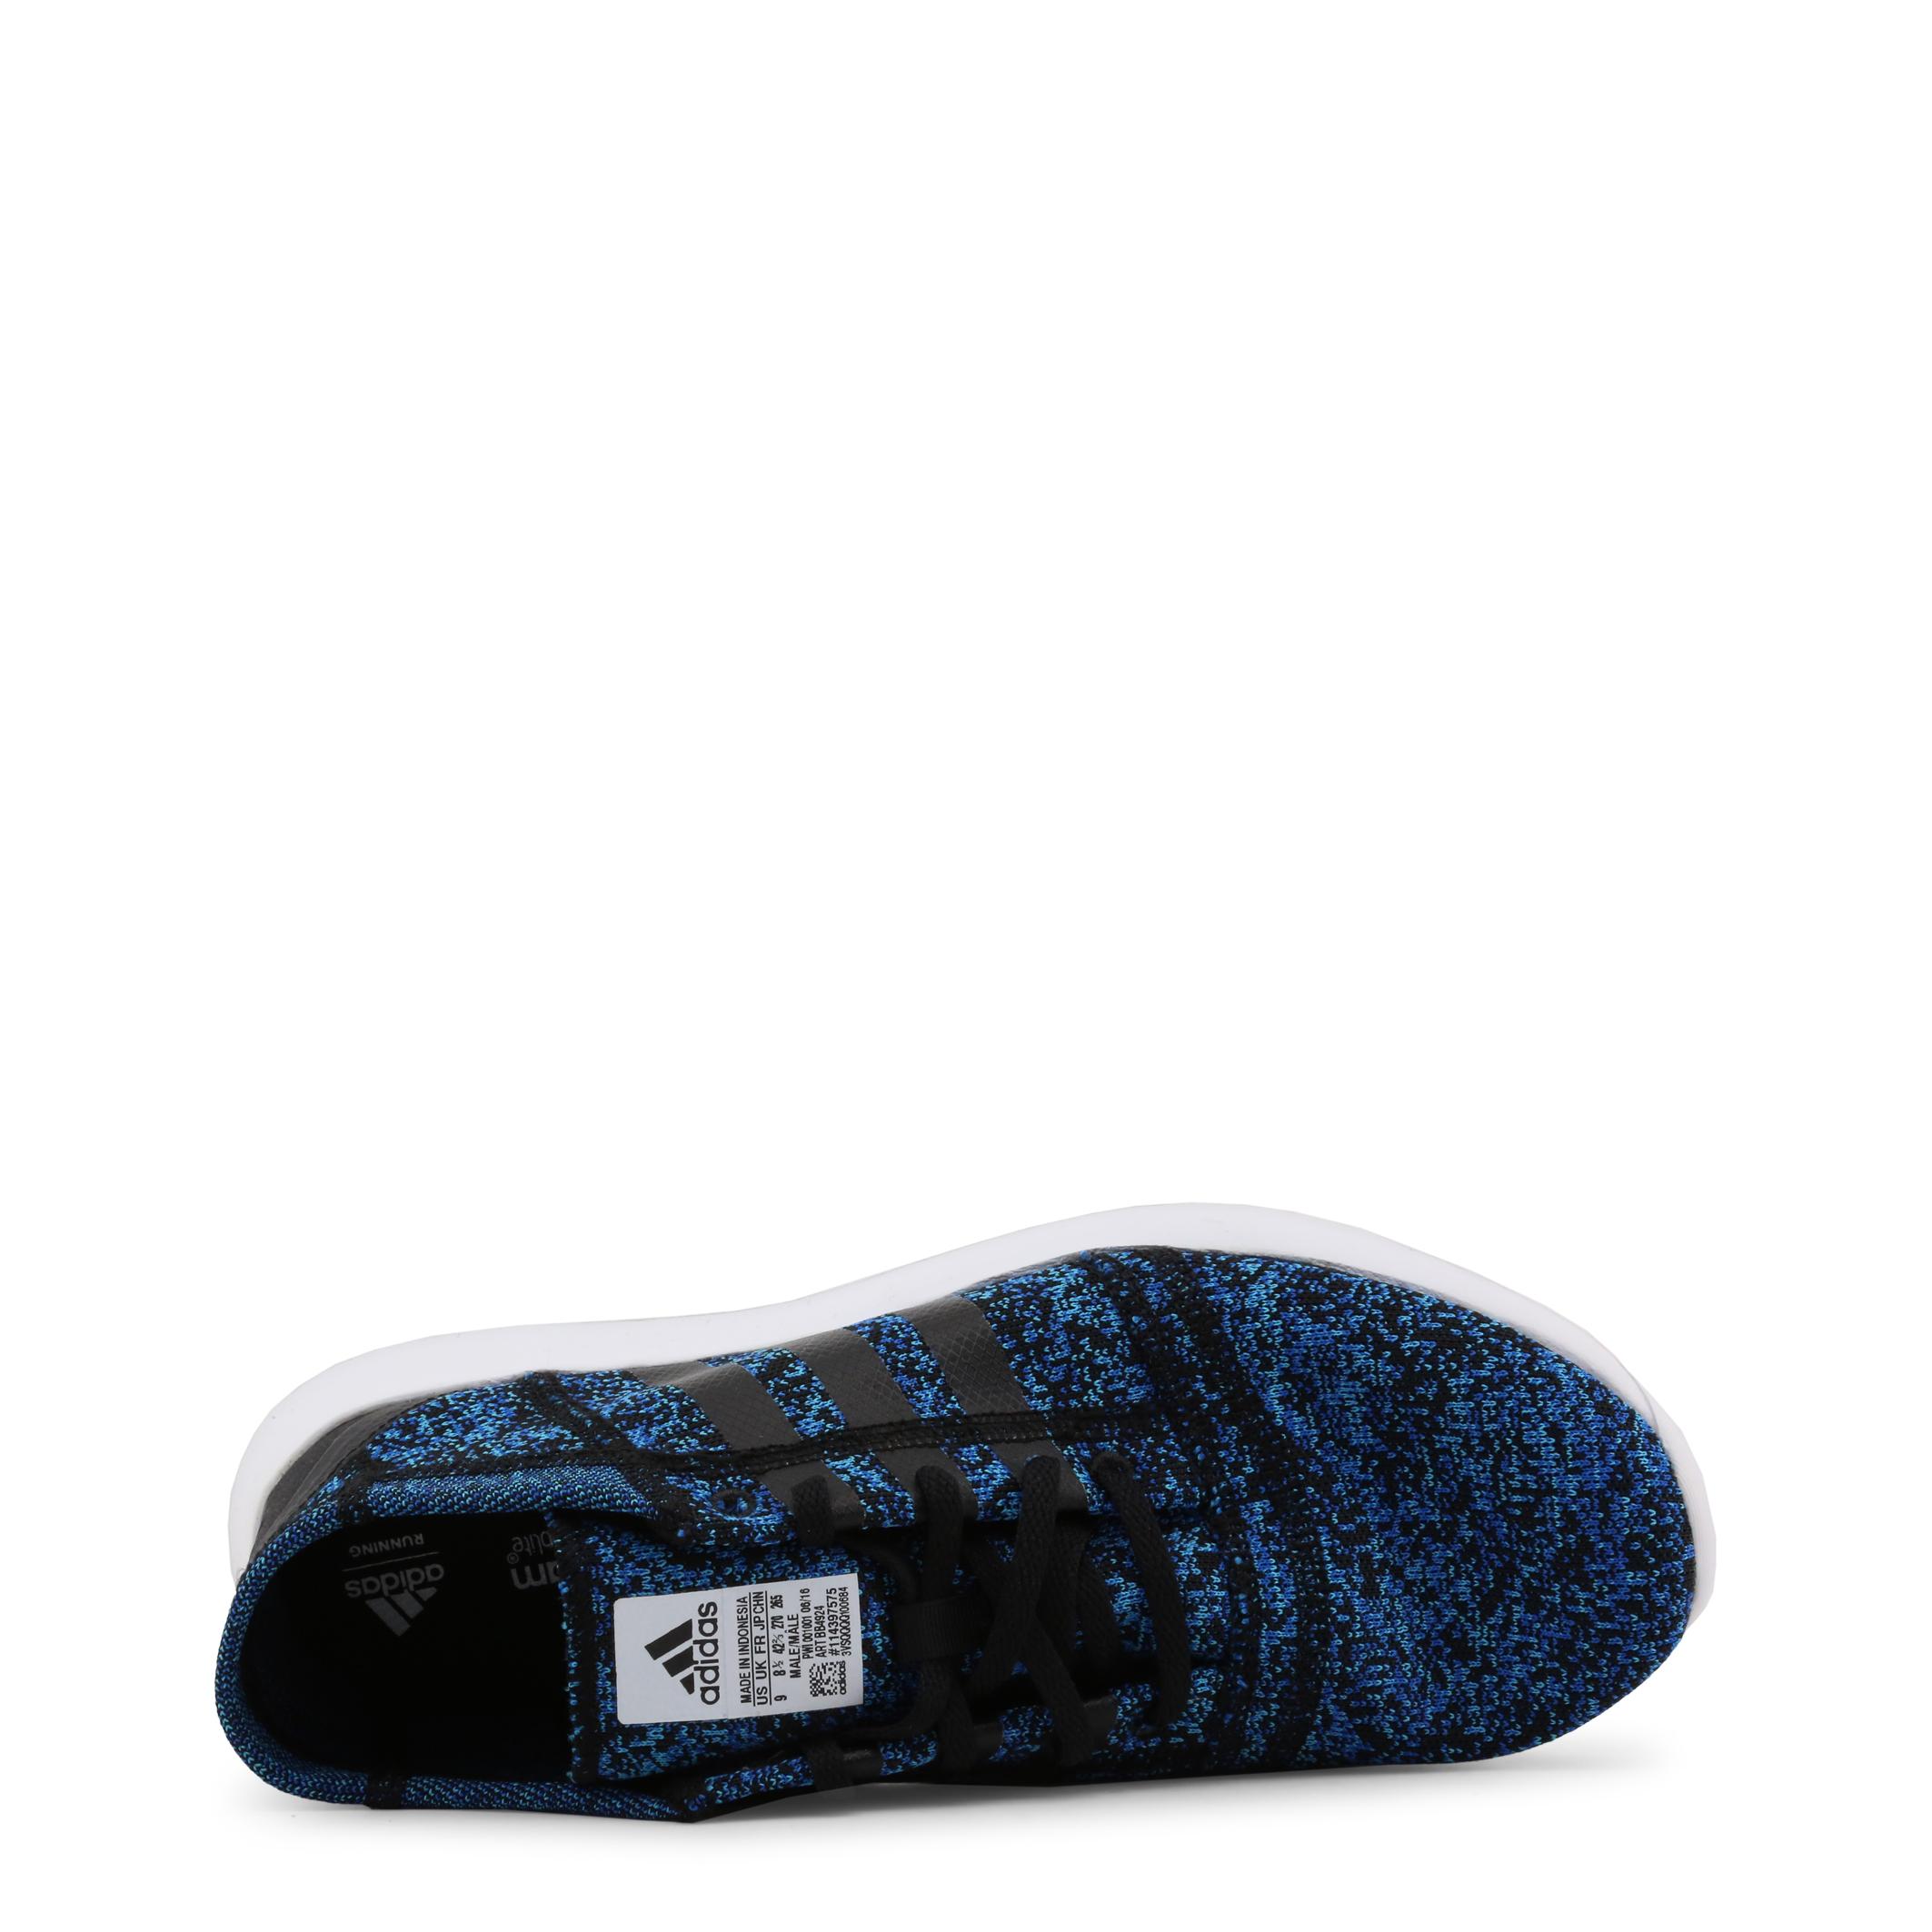 Sneakers-Adidas-ELEMENTS-REFINE2-Uomo-Blu-97924 miniatura 3